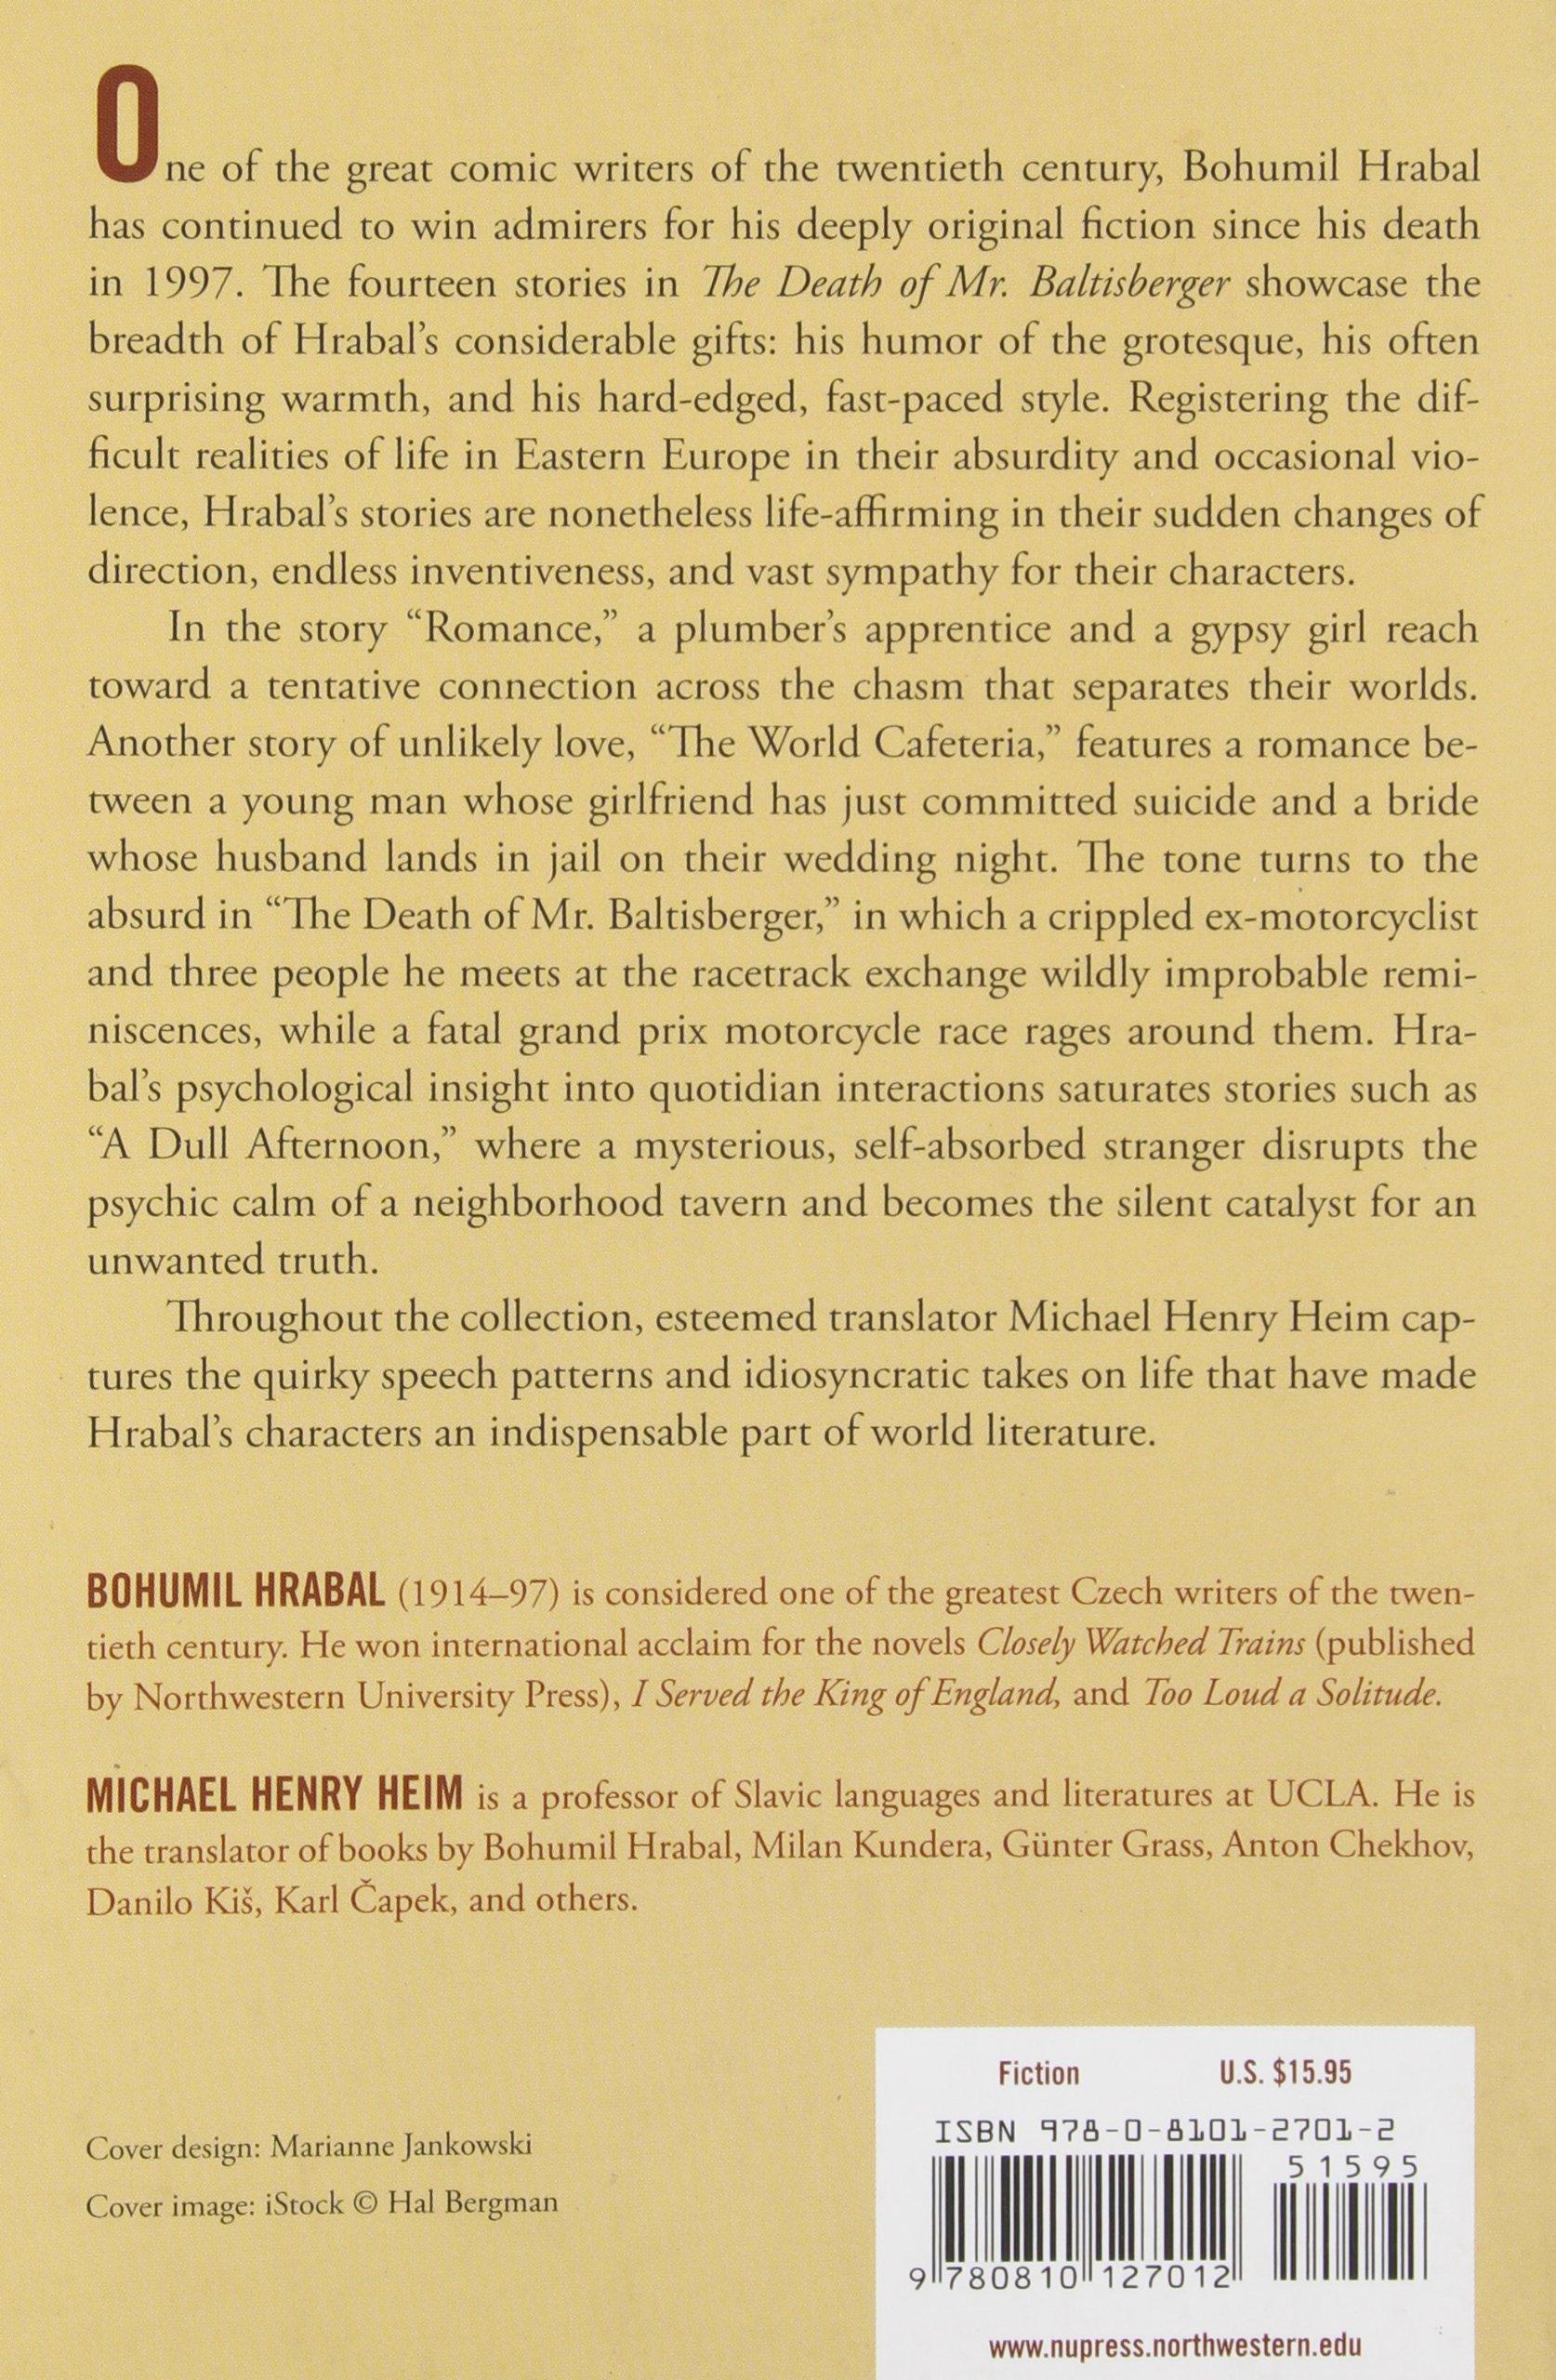 The Death Of Mr Baltisberger (northwestern World Classics): Bohumil  Hrabal, Michael Henry Heim: 9780810127012: Amazon: Books